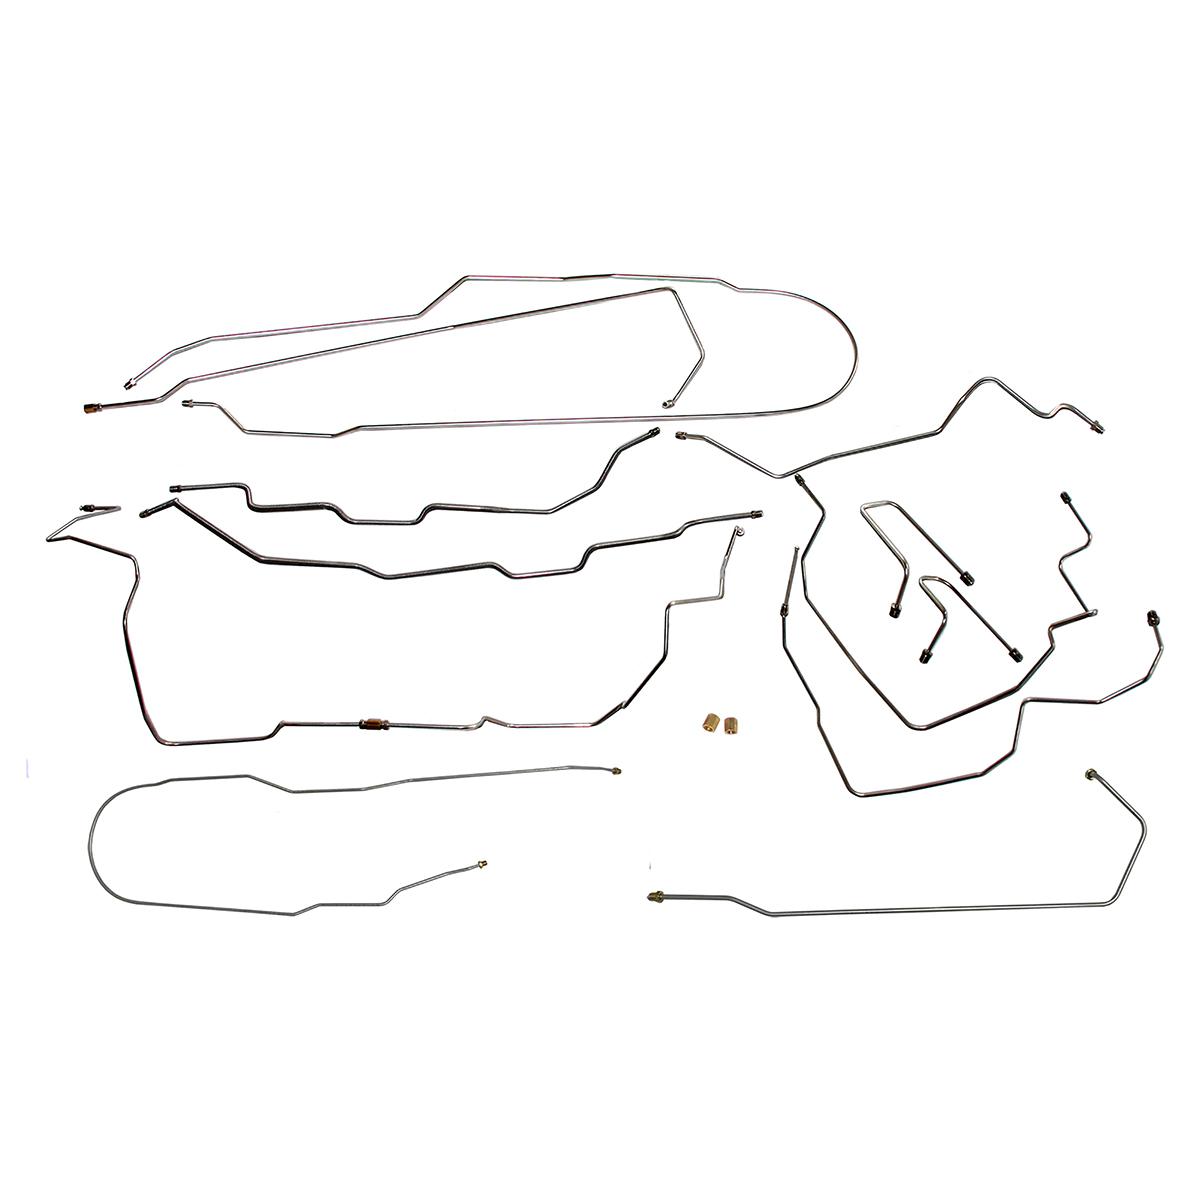 25 Chevy Tahoe Brake Line Diagram